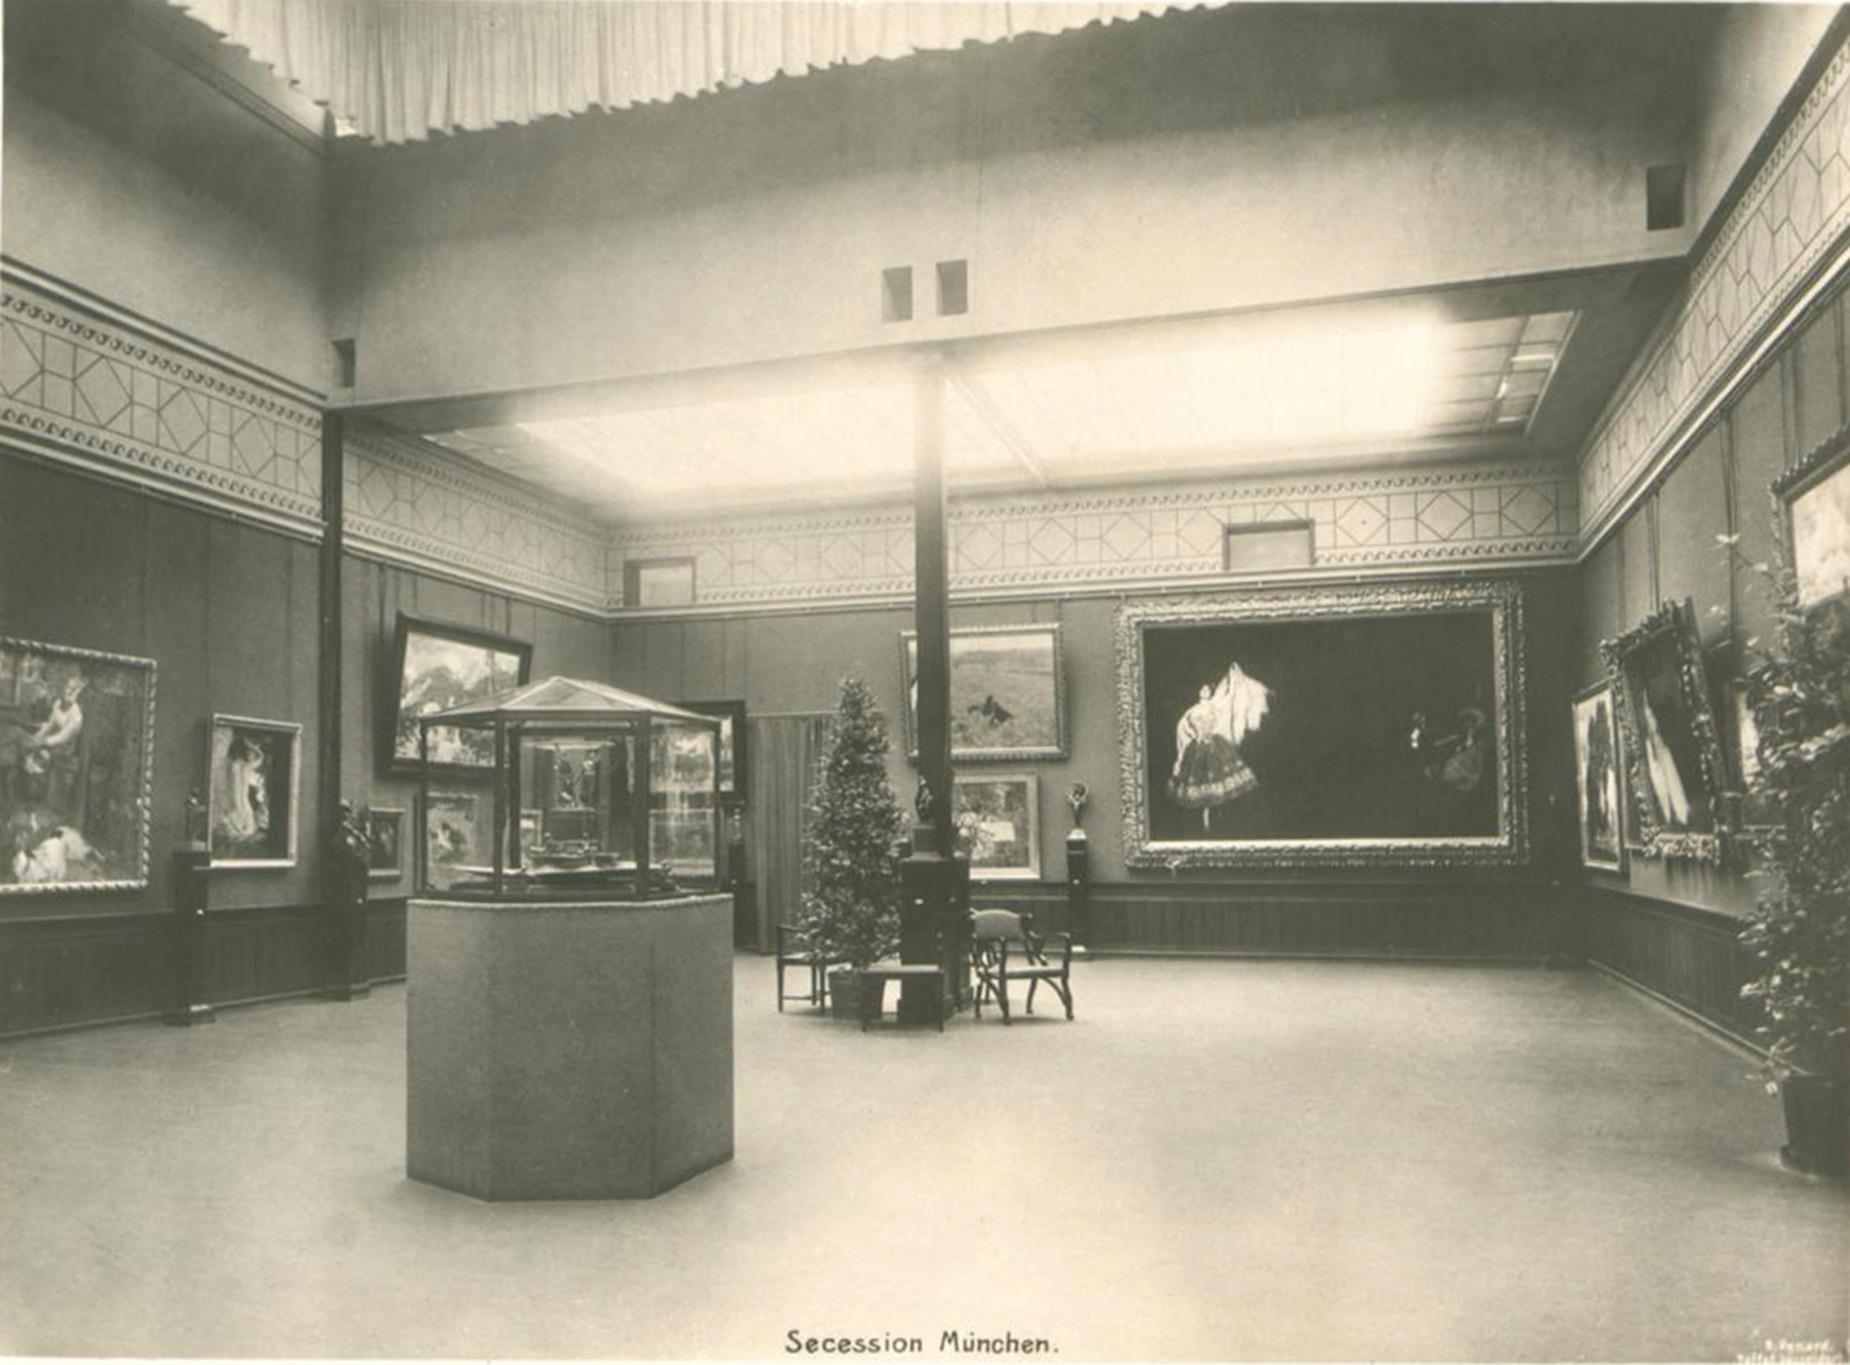 Raum München file kunstpalast raum secession münchen foto otto renard 1902 jpg